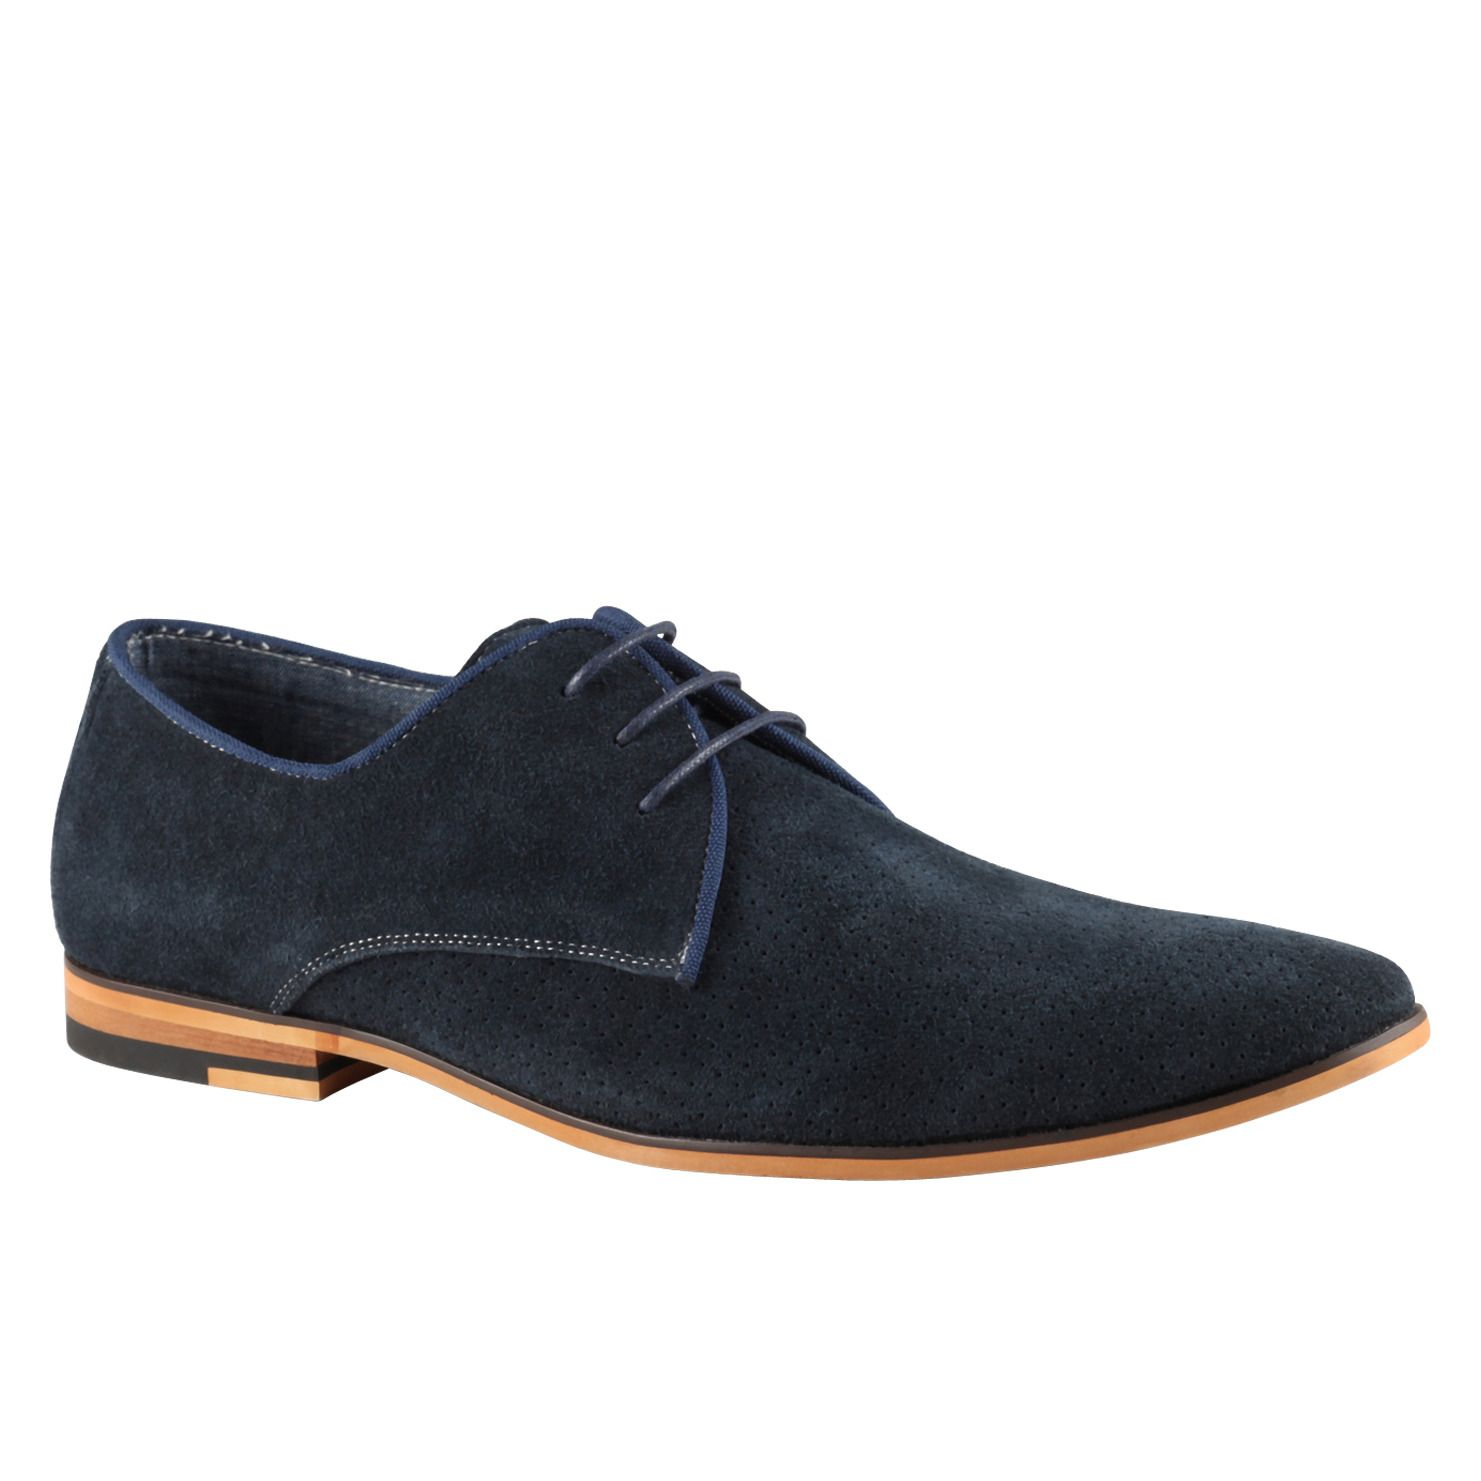 lacoste shoes formal batata palha photos